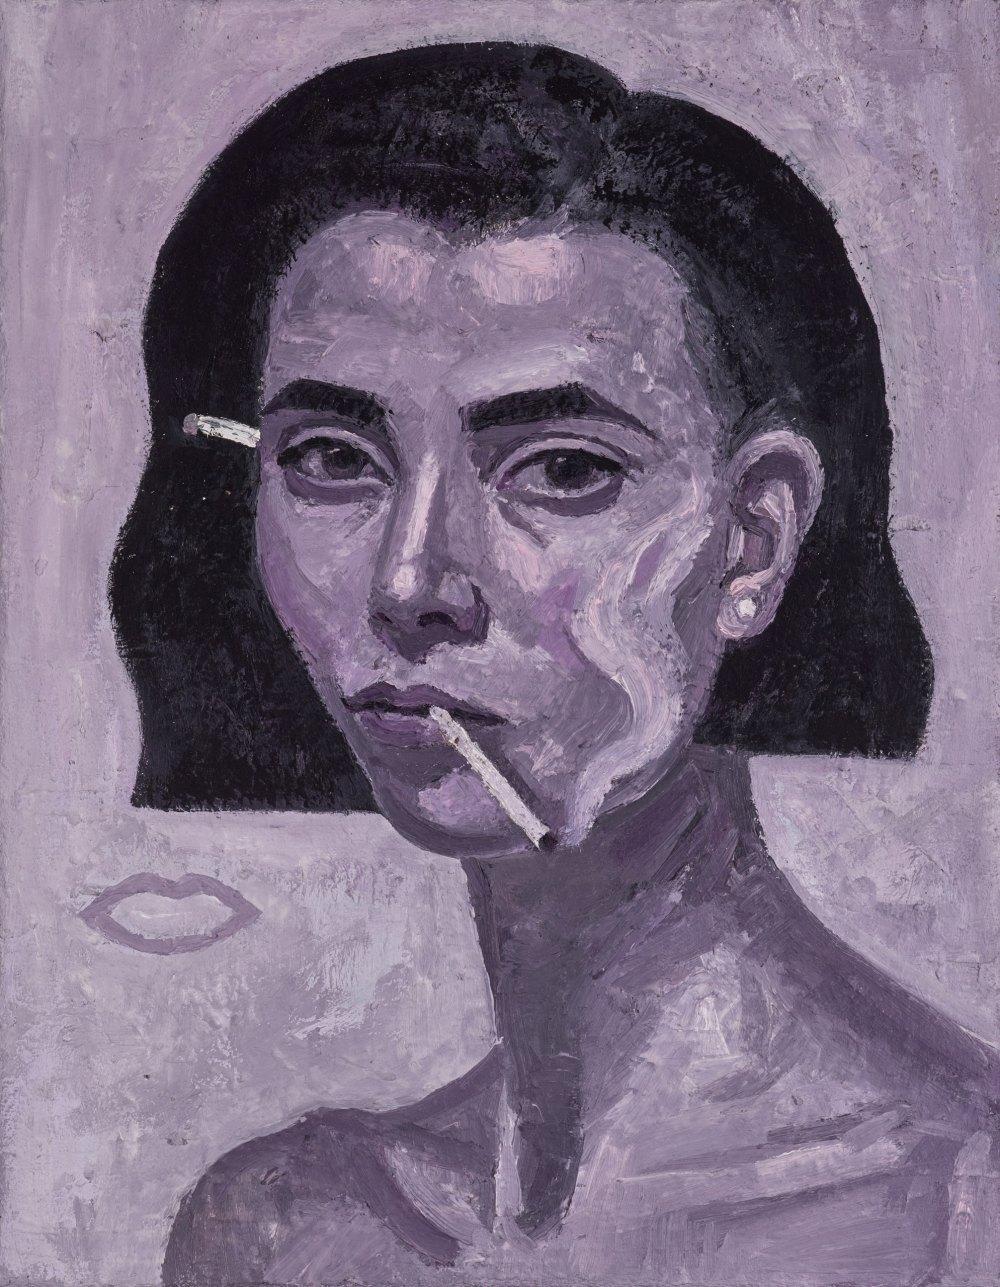 Yvette Coppersmith - Companion piece. Rose Burn, self-portrait